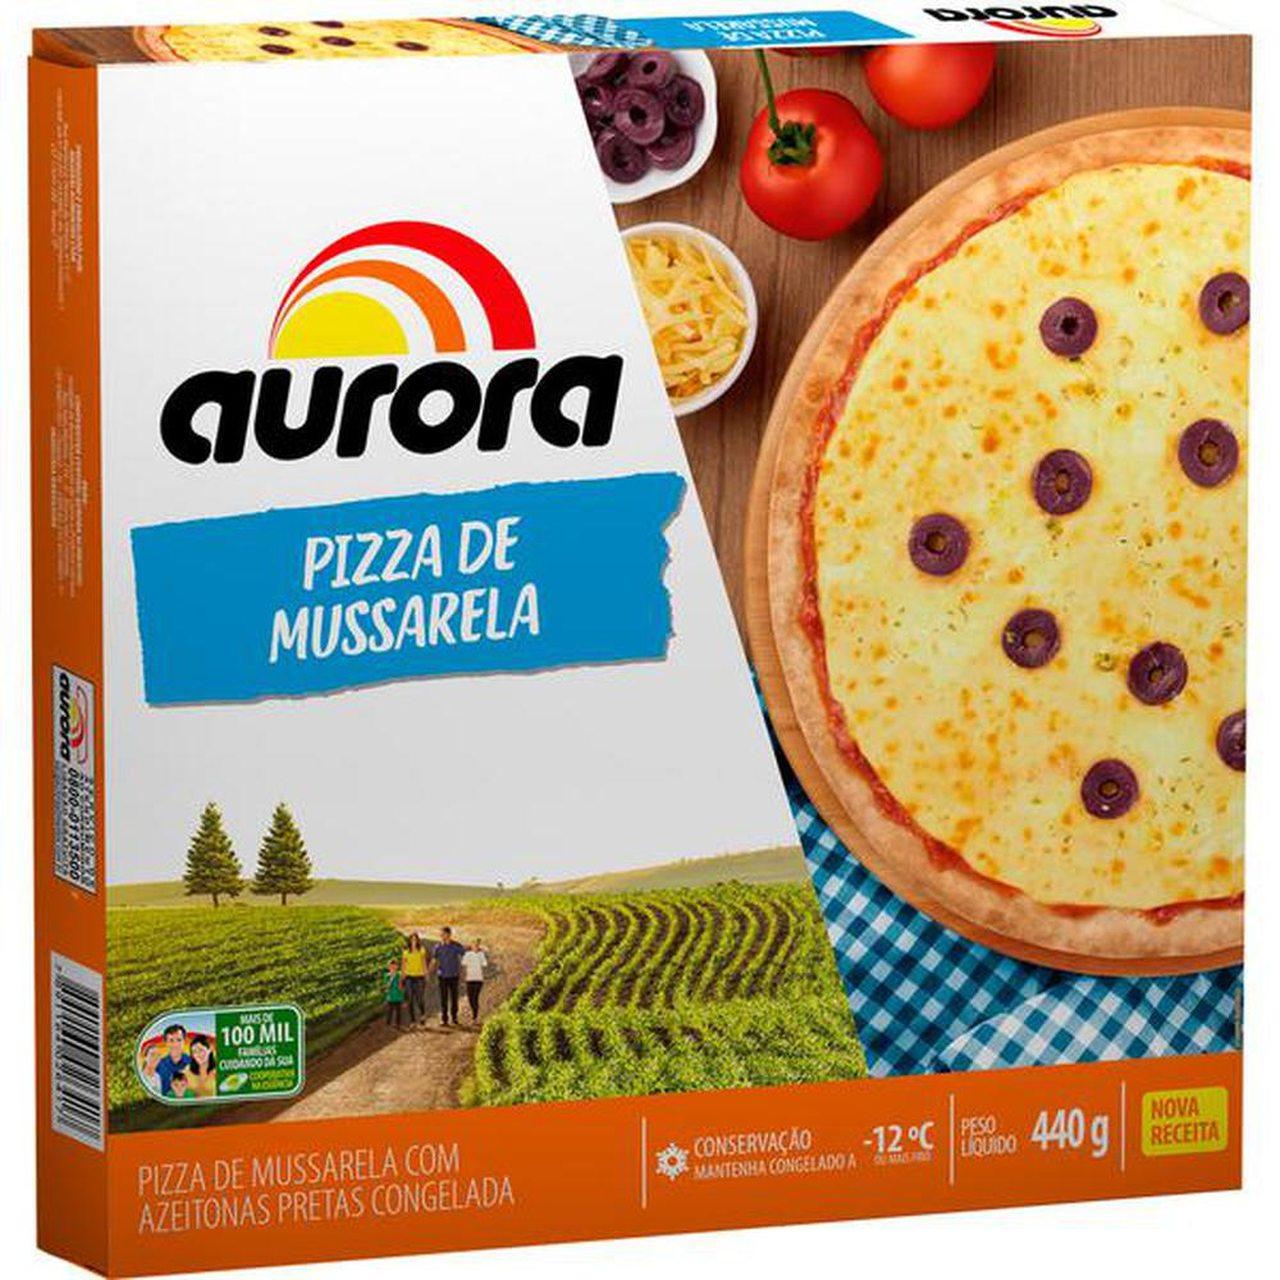 PIZZA MUSSARELA AURORA 440G  - JJPIVOTTO - Comercio de Frutas